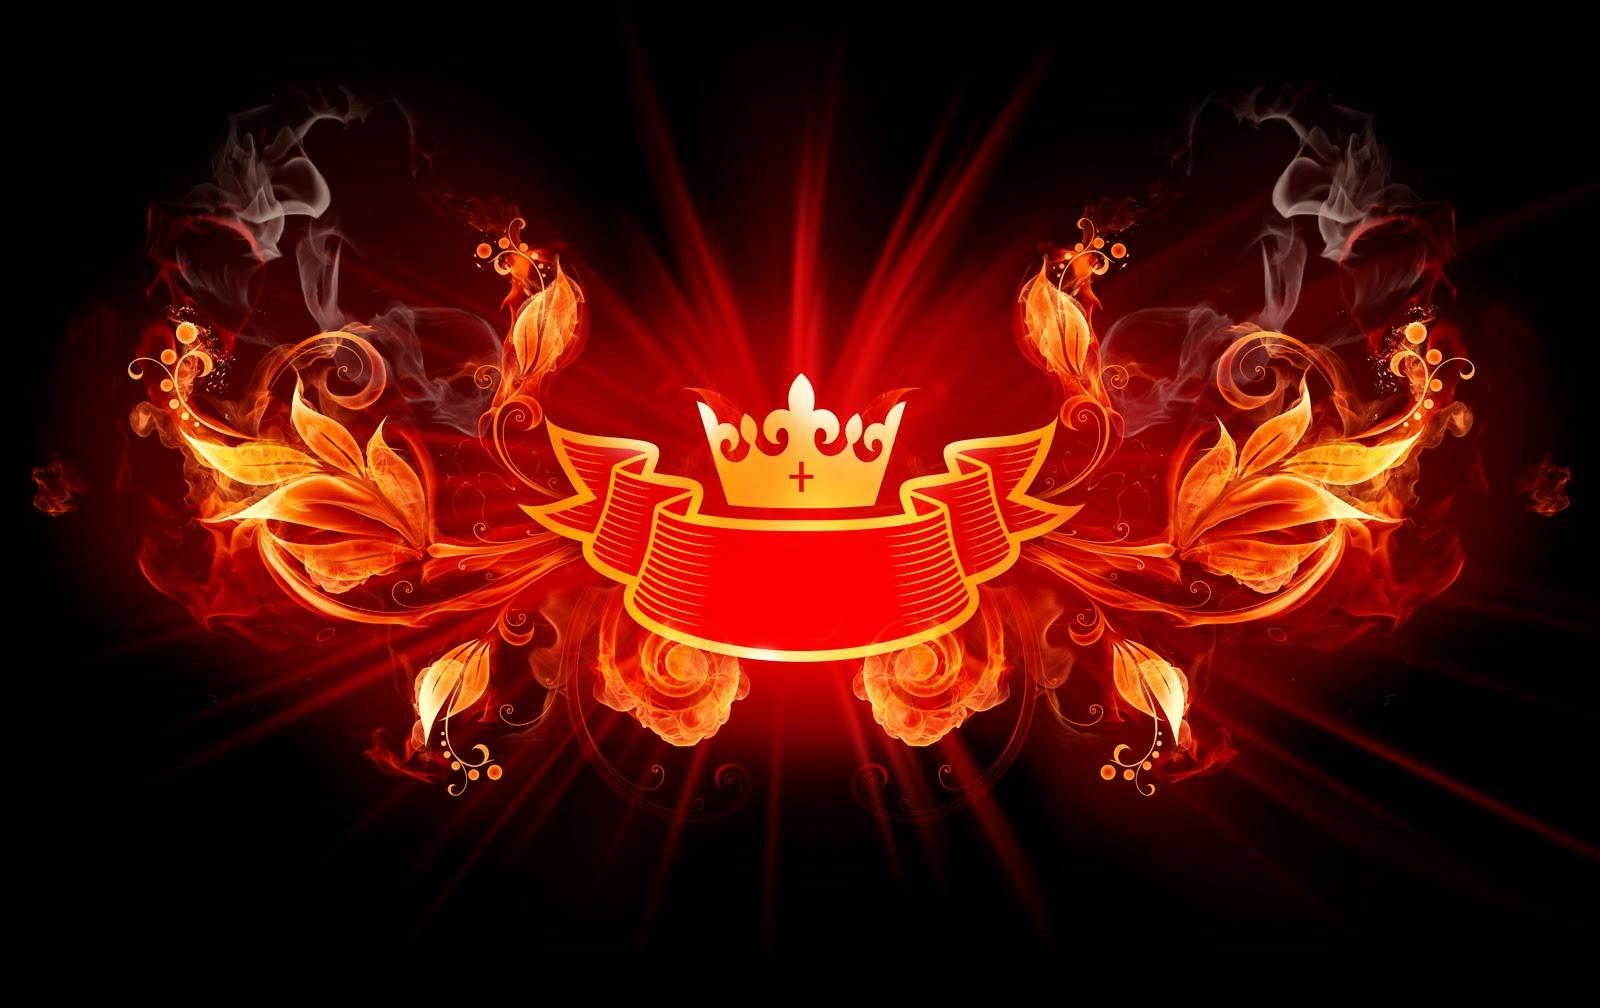 Fire Crown Wallpaper 1600x1008